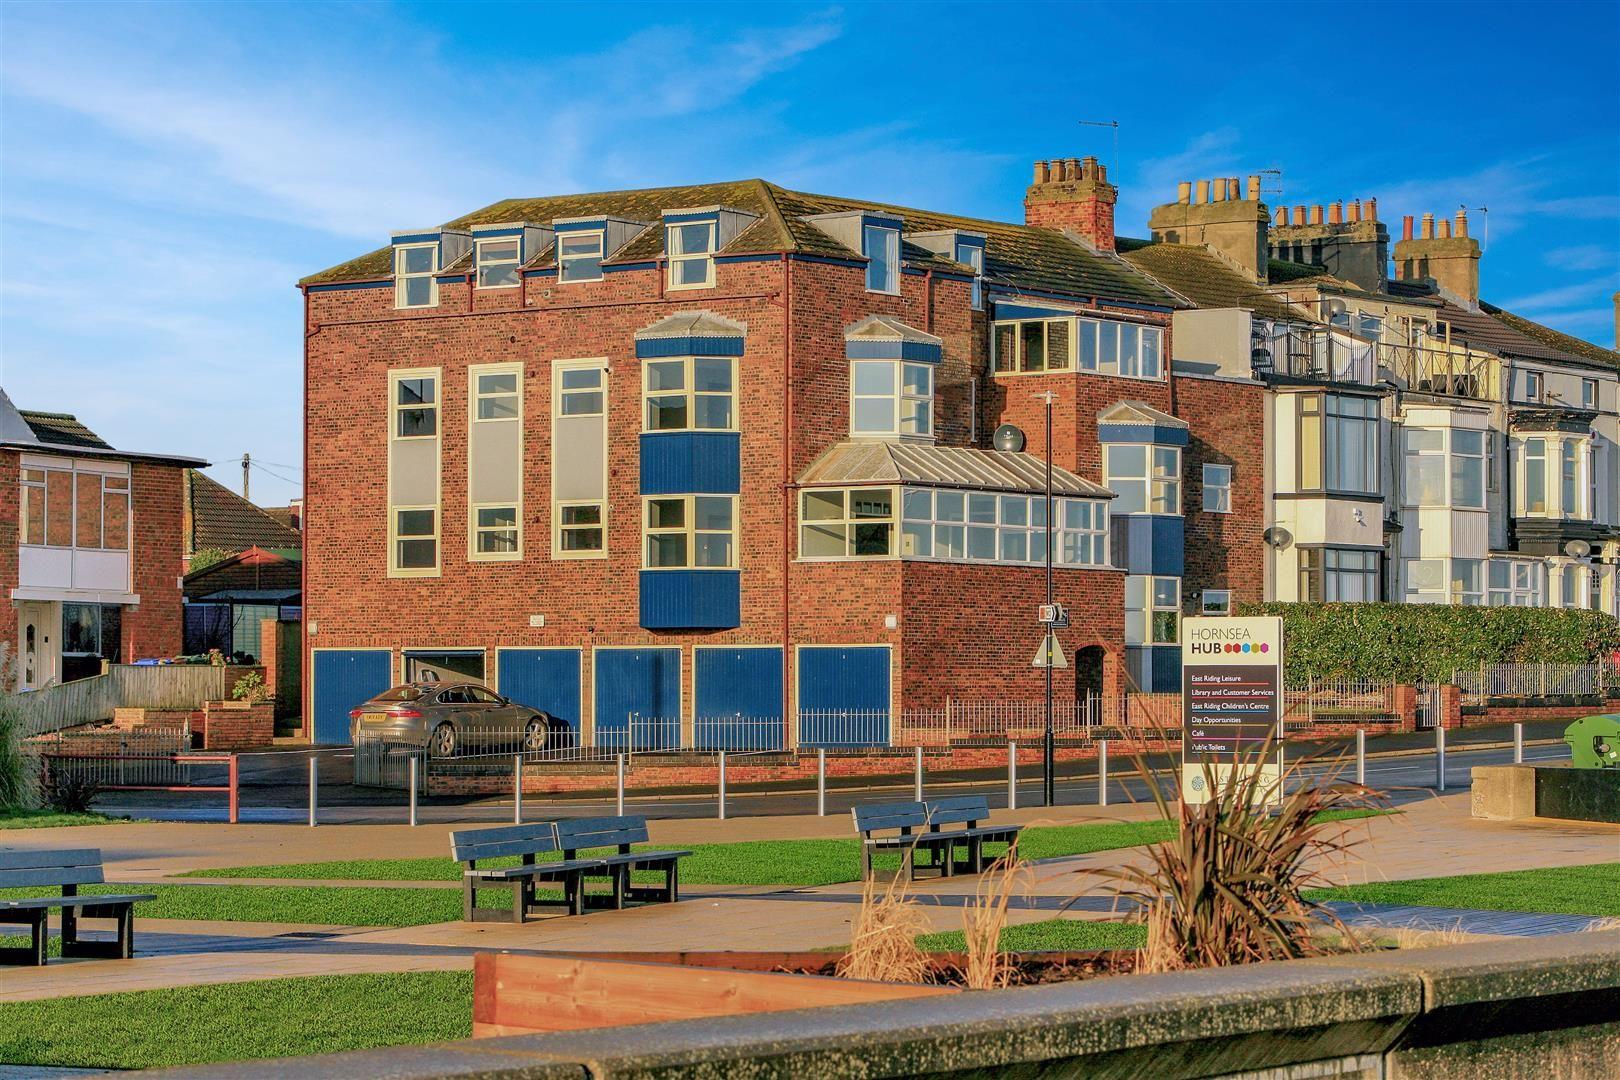 Property photo 1 of 12. Promenade View Hornsea.Jpg